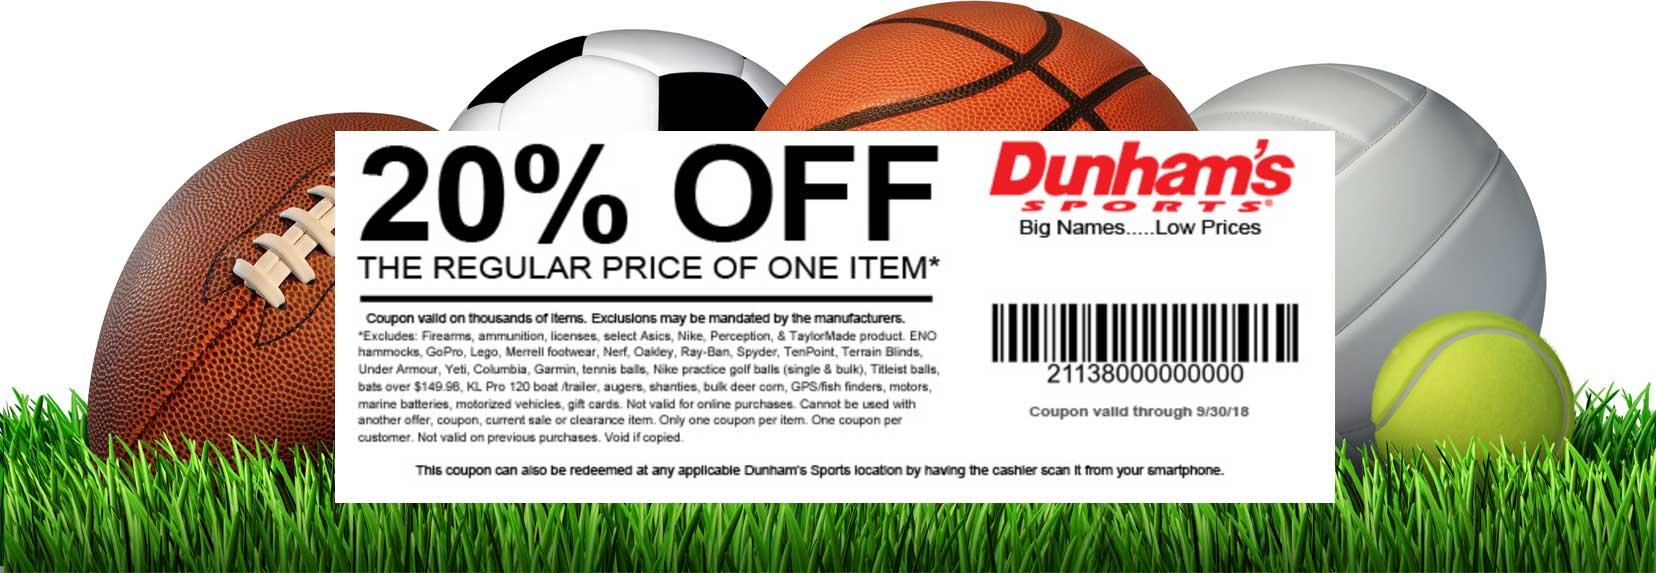 Dunhams Sports coupons & promo code for [June 2020]